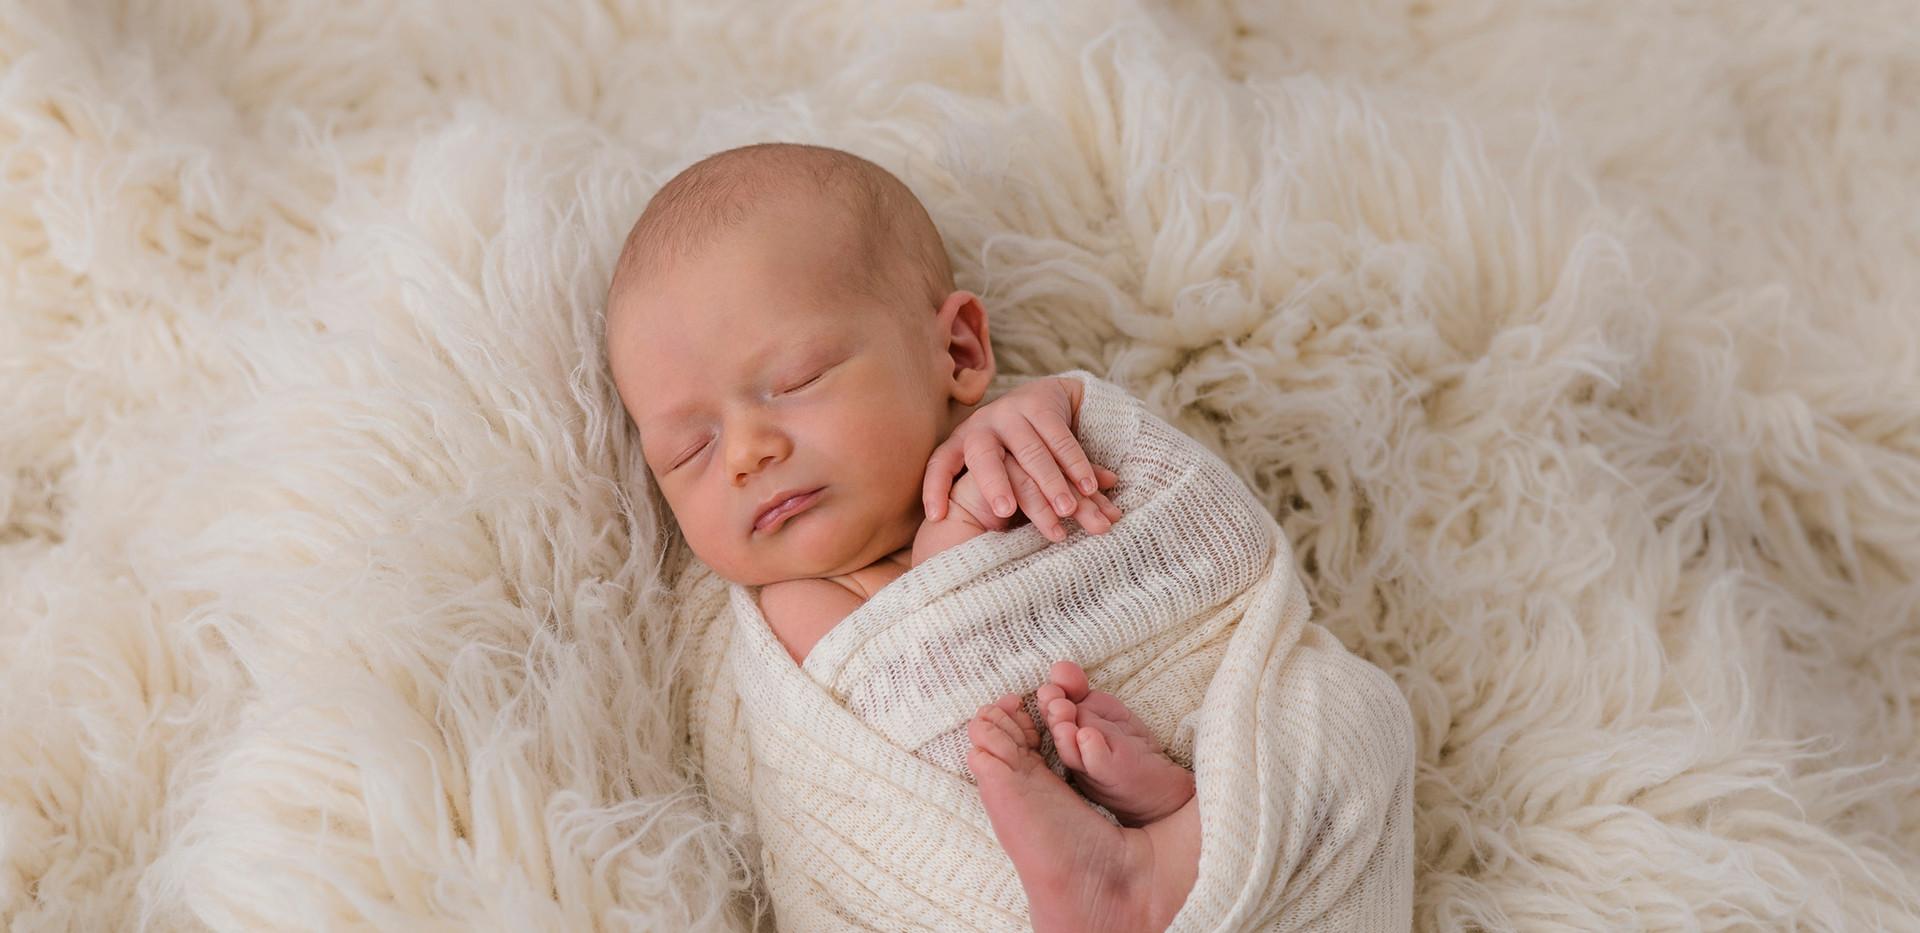 Newborn, Baby, Newbornshooting, Neugeborenenfotografie, Neugeborenes, Baby Wrap, Babyfotos, Babyshooting, Babyfotografie, Babyfotos Wien, Babyfotos Korneuburg, Babyfotos Tulln